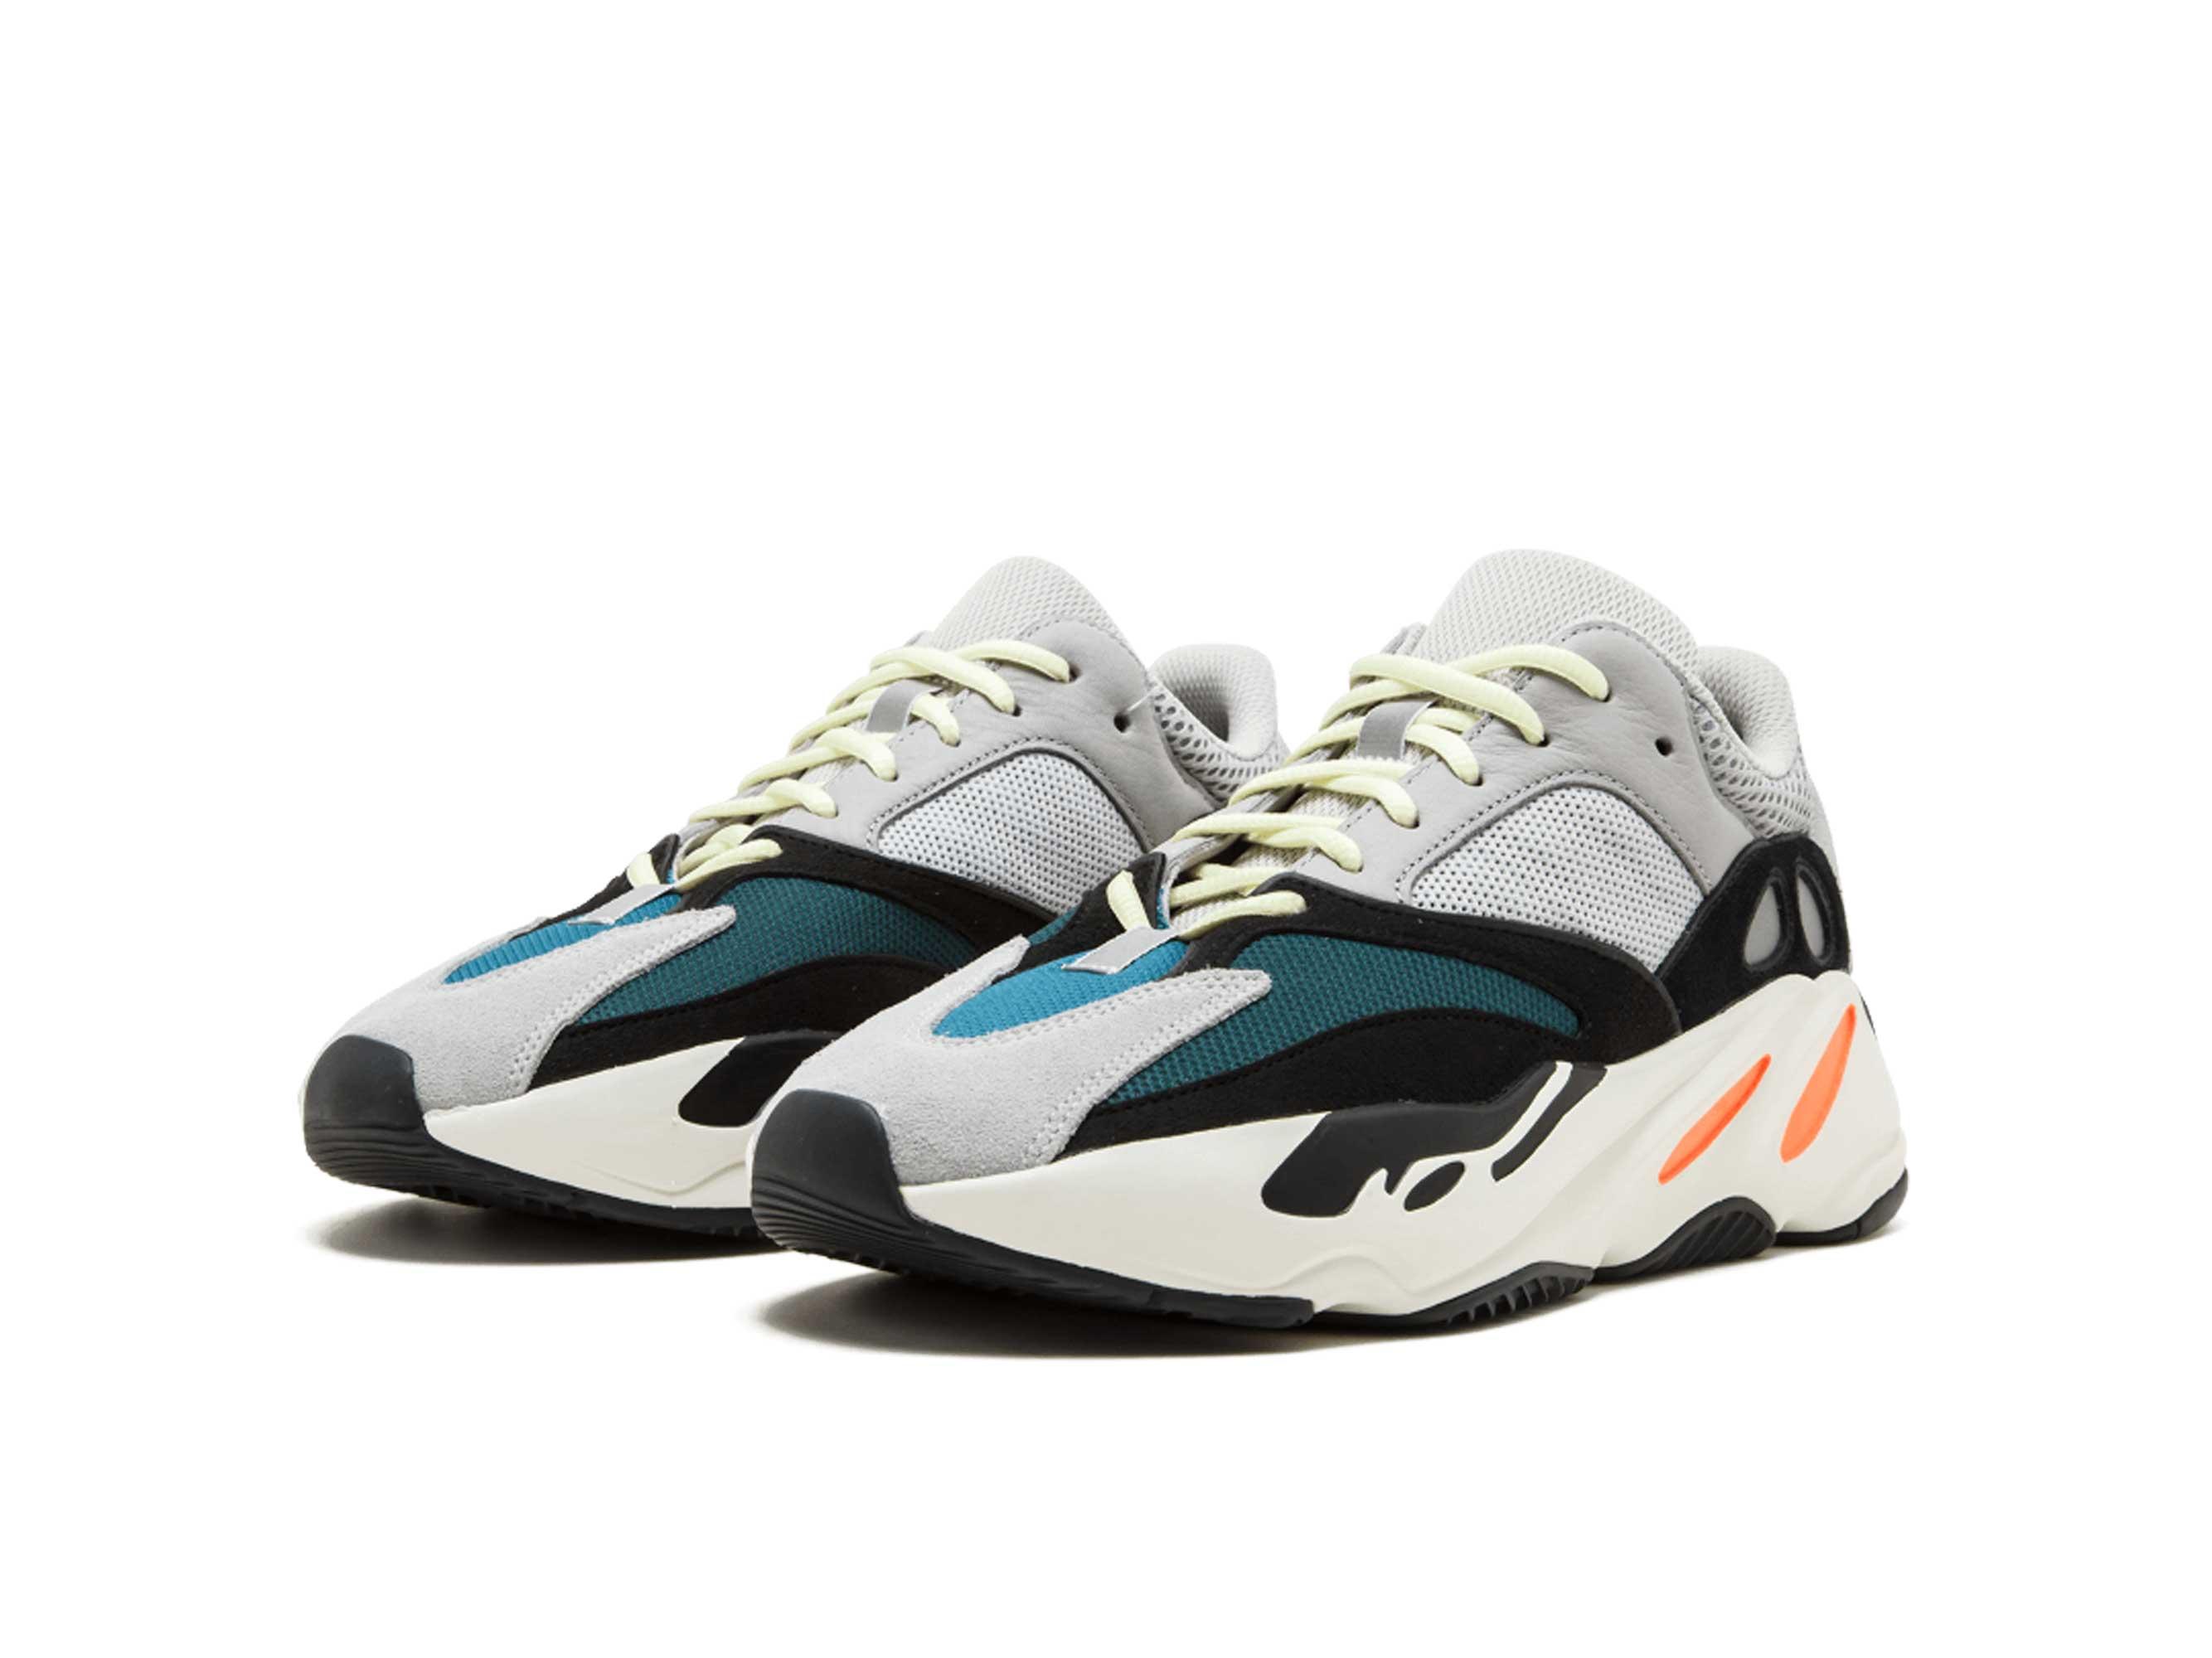 Yeezy Boost 700 wave Runner Adidas b75571 mgsogr